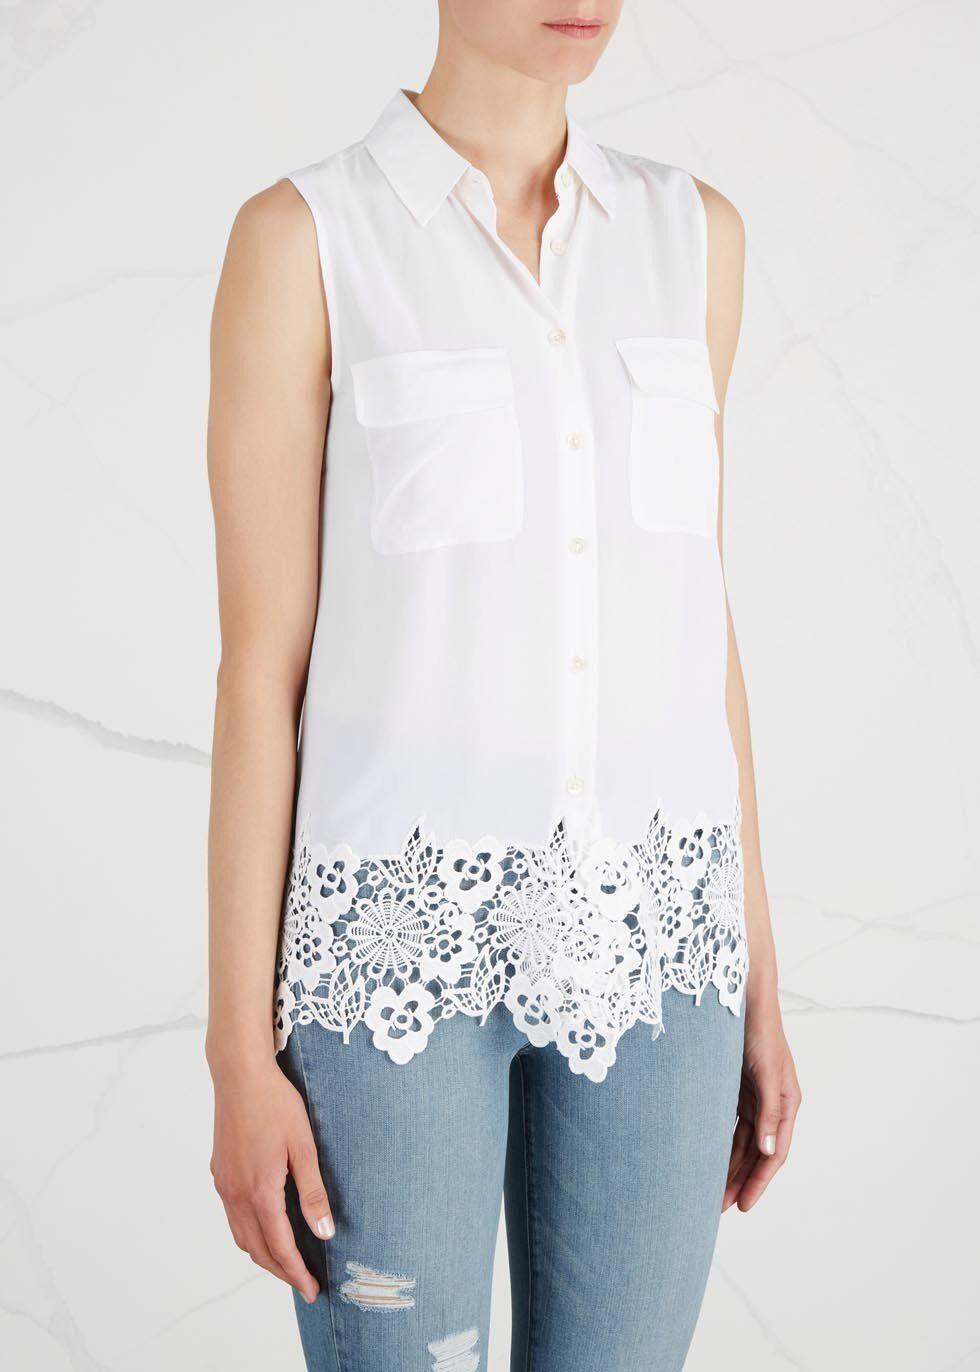 NWT Equipment Sleeveless Signature Lace Trim Silk Shirt Bright Weiß Größe M